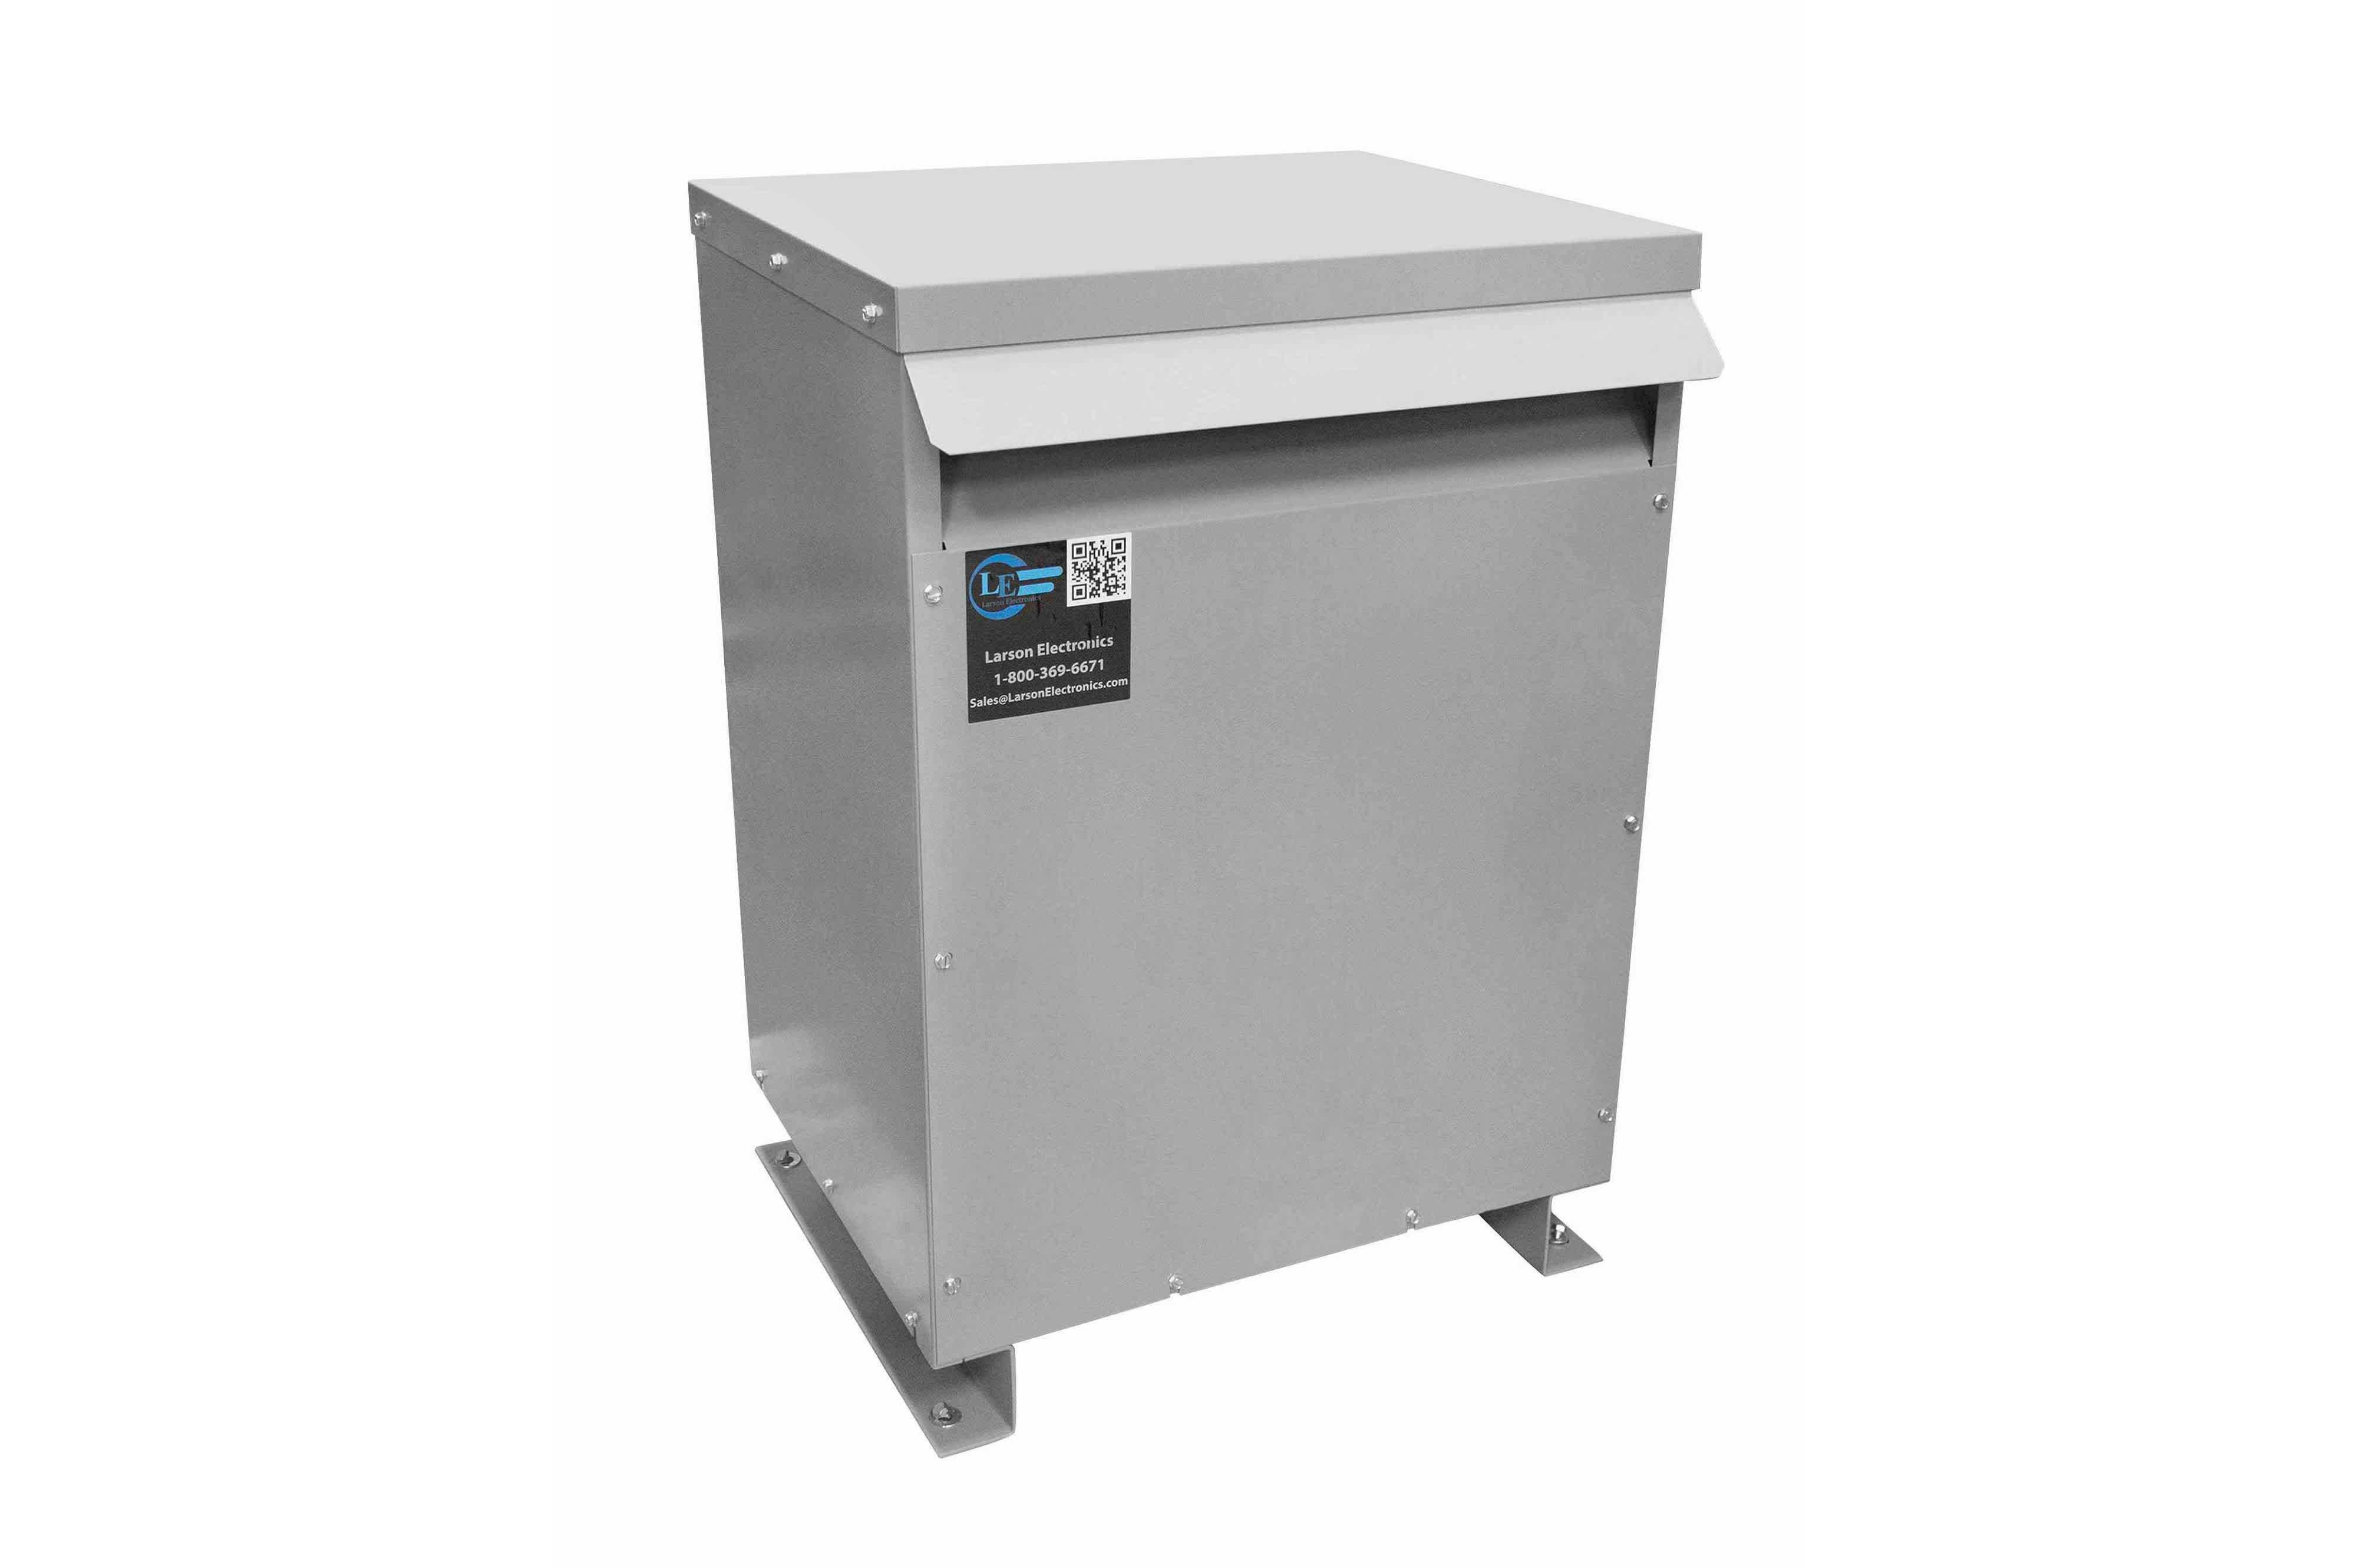 300 kVA 3PH Isolation Transformer, 240V Wye Primary, 400V Delta Secondary, N3R, Ventilated, 60 Hz